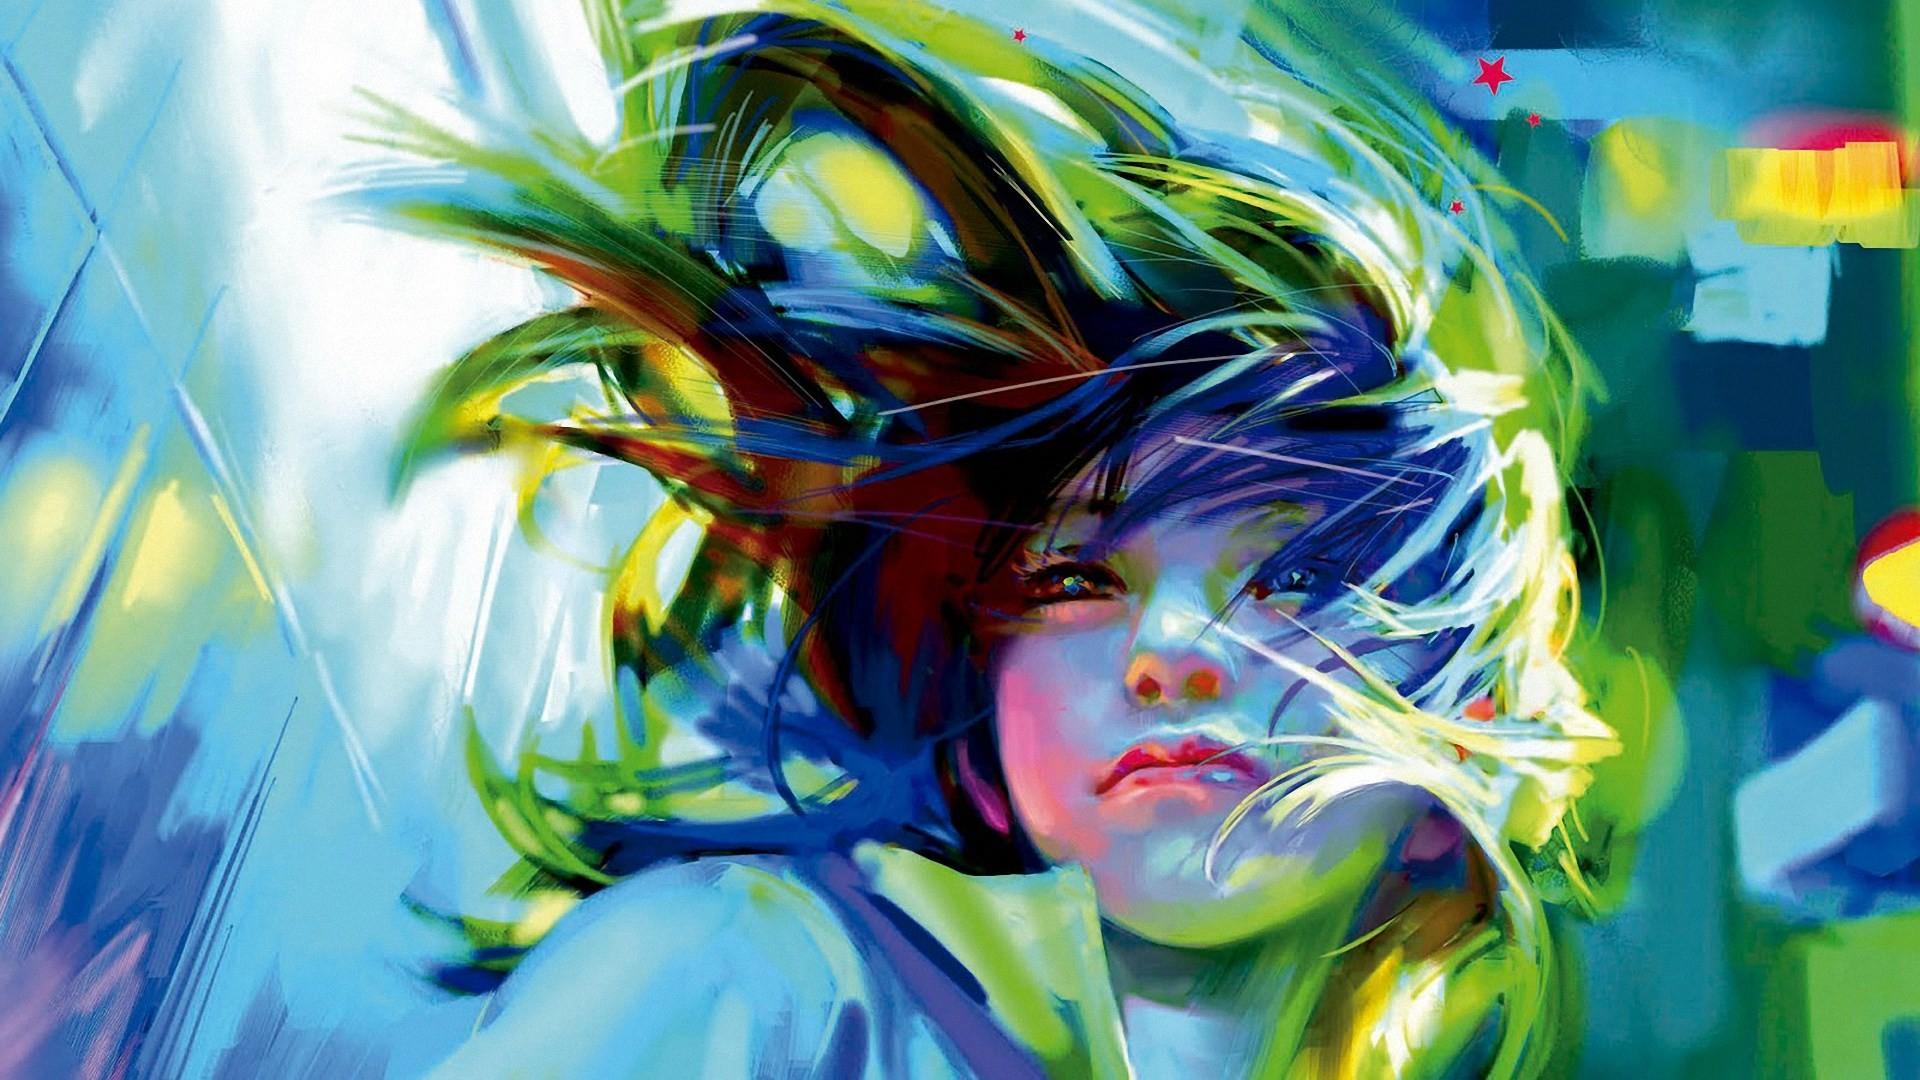 Girl Boy Love Birds Wallpaper Download Crazy Wallpaper Backgrounds 183 ①